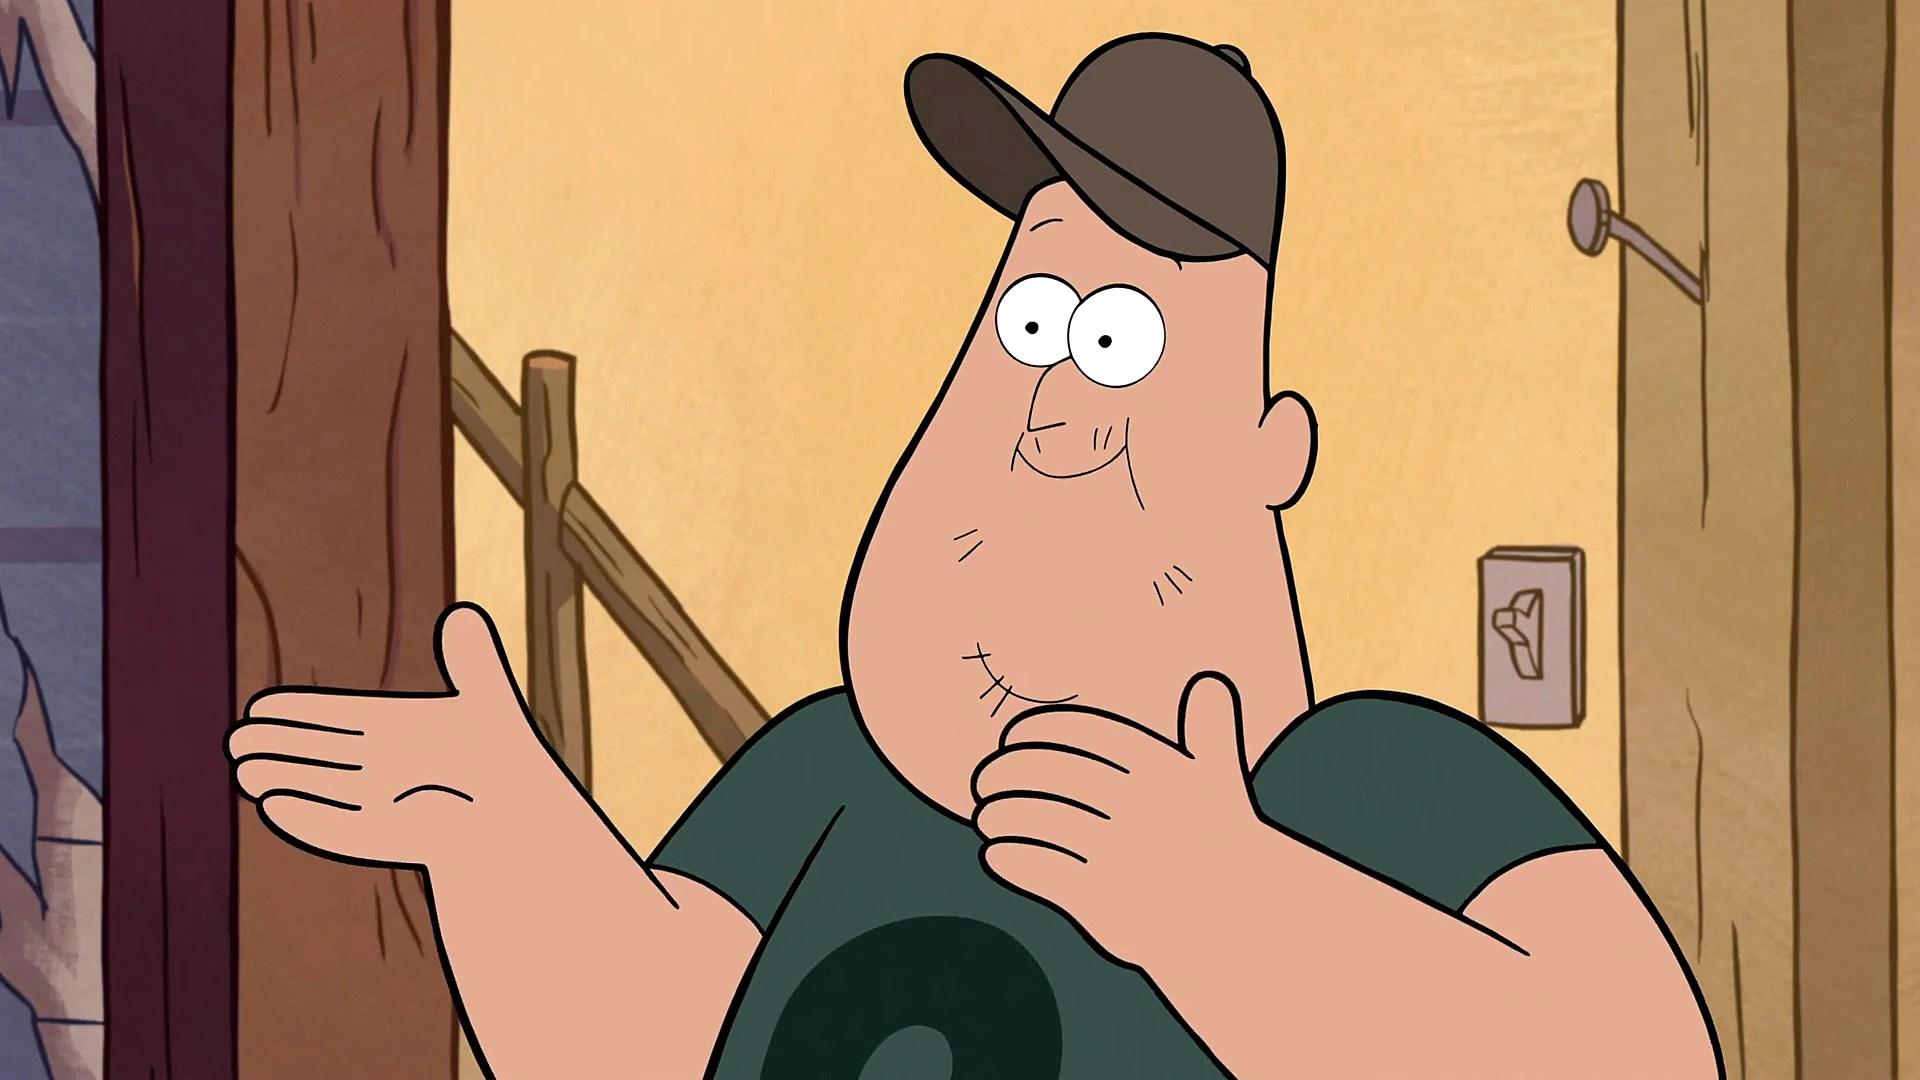 Gravity Falls Waddles Wallpaper Soos Ramirez Gravity Falls Wiki Fandom Powered By Wikia